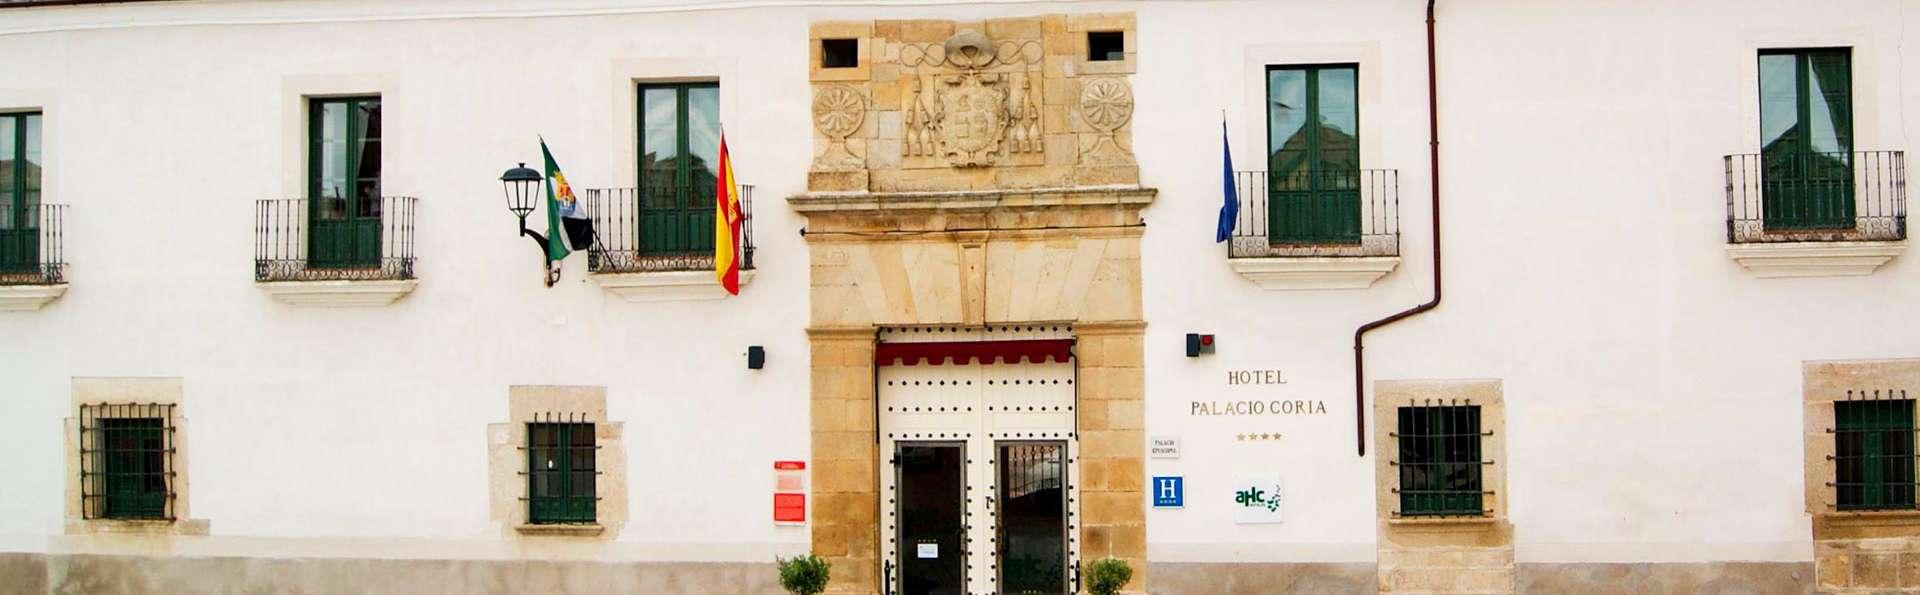 AHC Hotel Palacio Coria - EDIT_FRONT_01.jpg